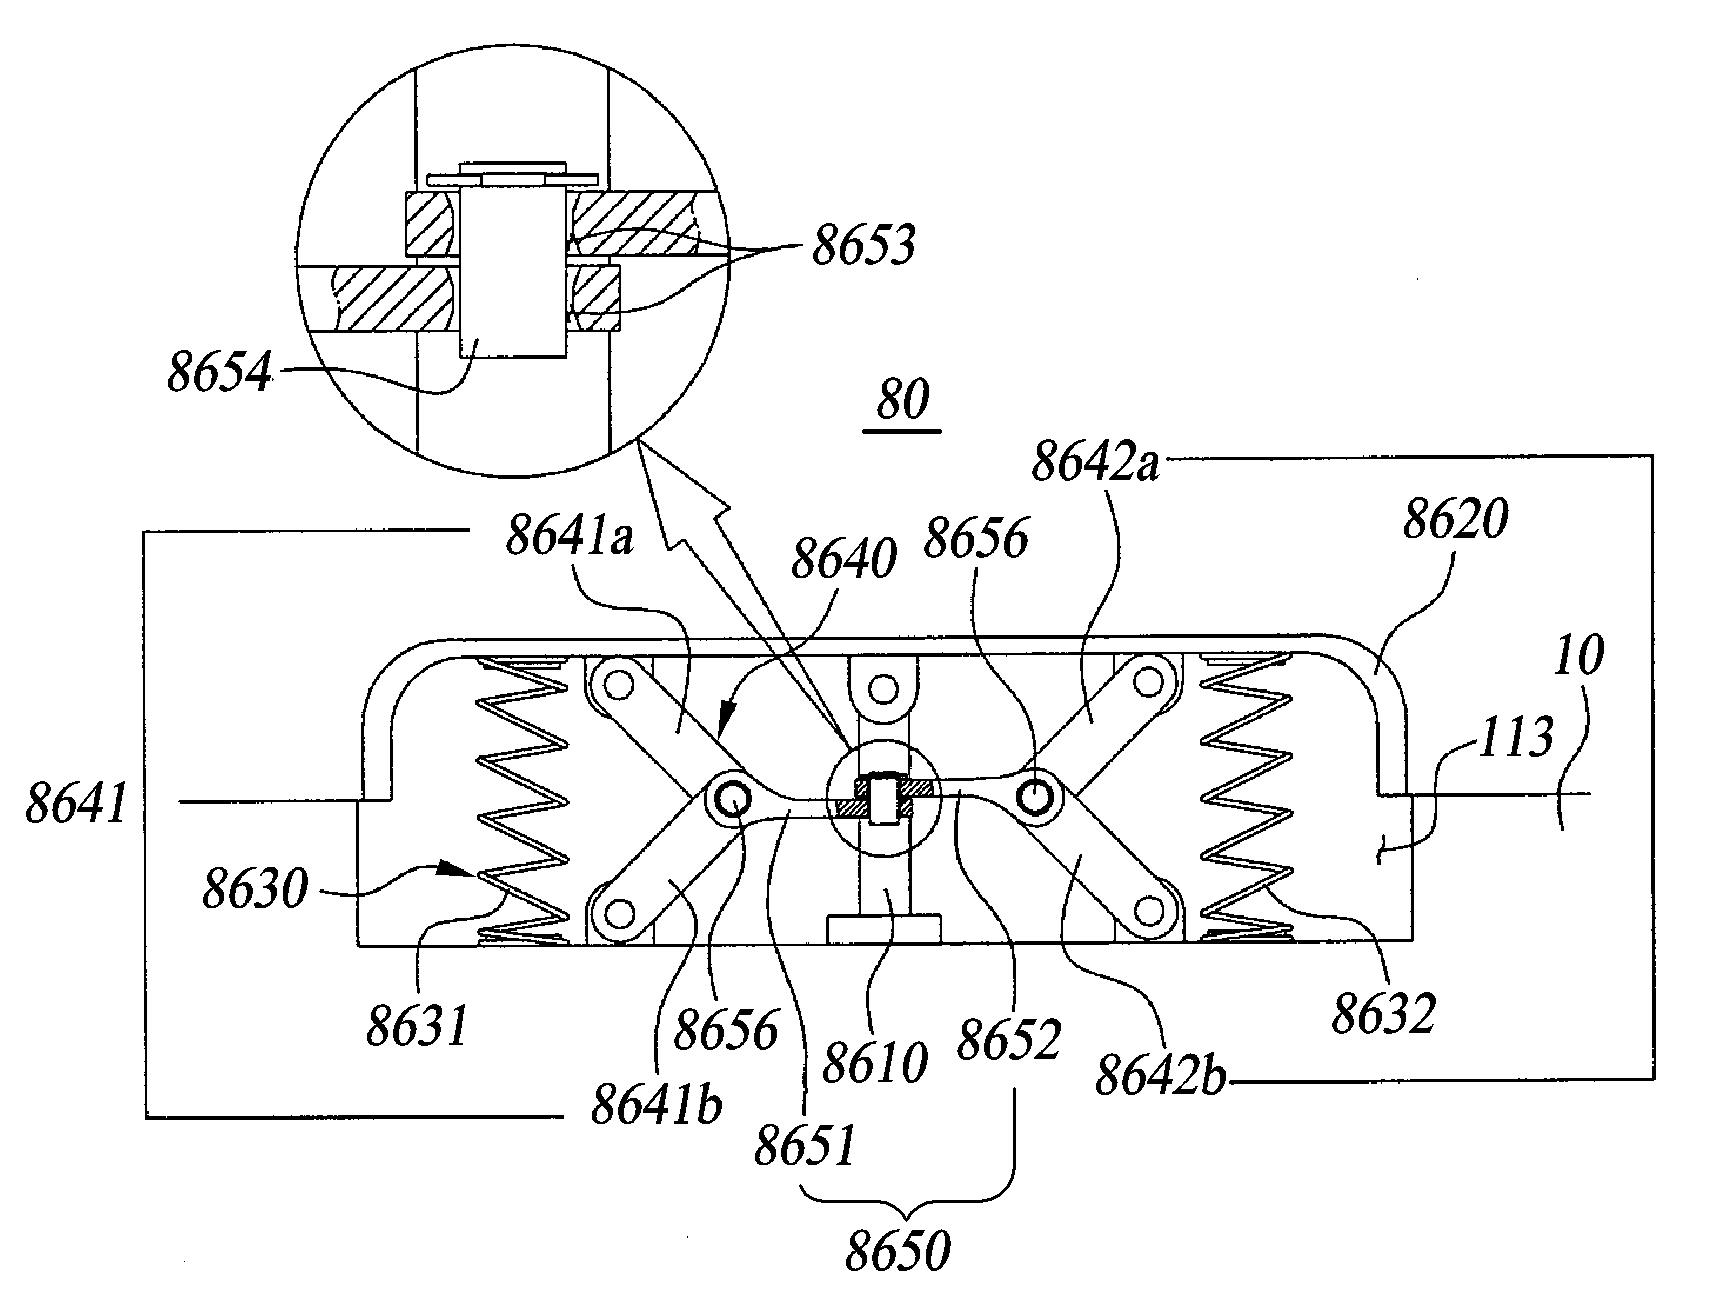 706 farmall transmission diagram wiring diagram database Oliver 77 Wiring-Diagram ih 606 wiring diagram best wiring library farmall 706 cab 706 farmall transmission diagram